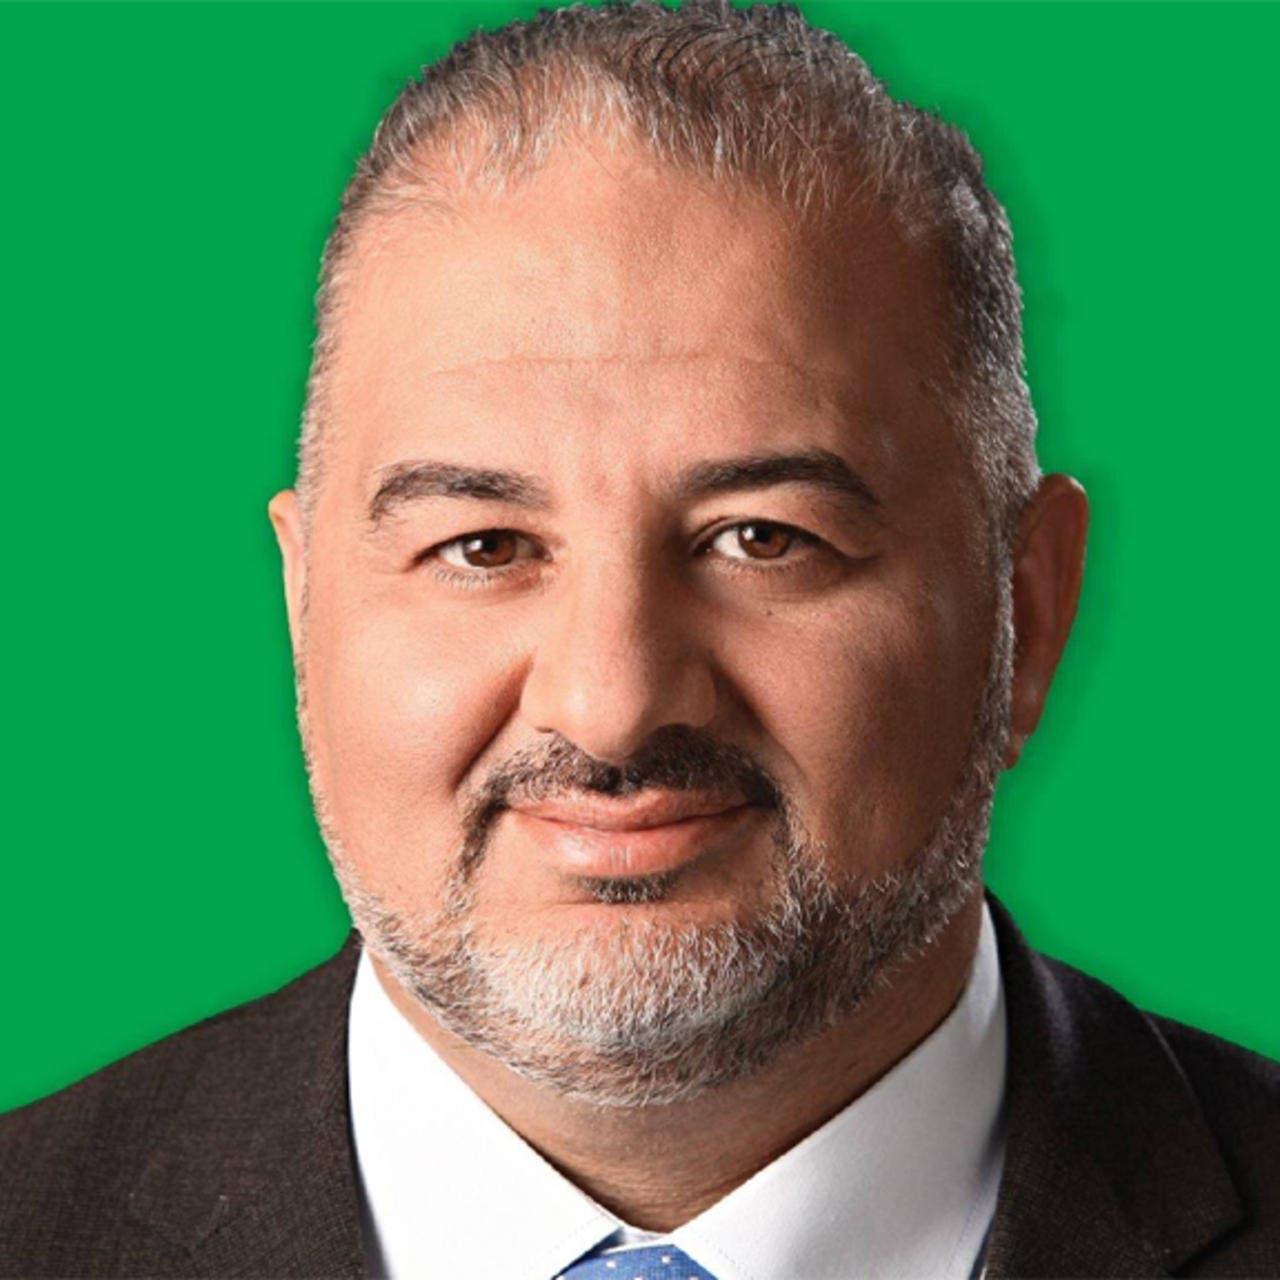 منصور عباس